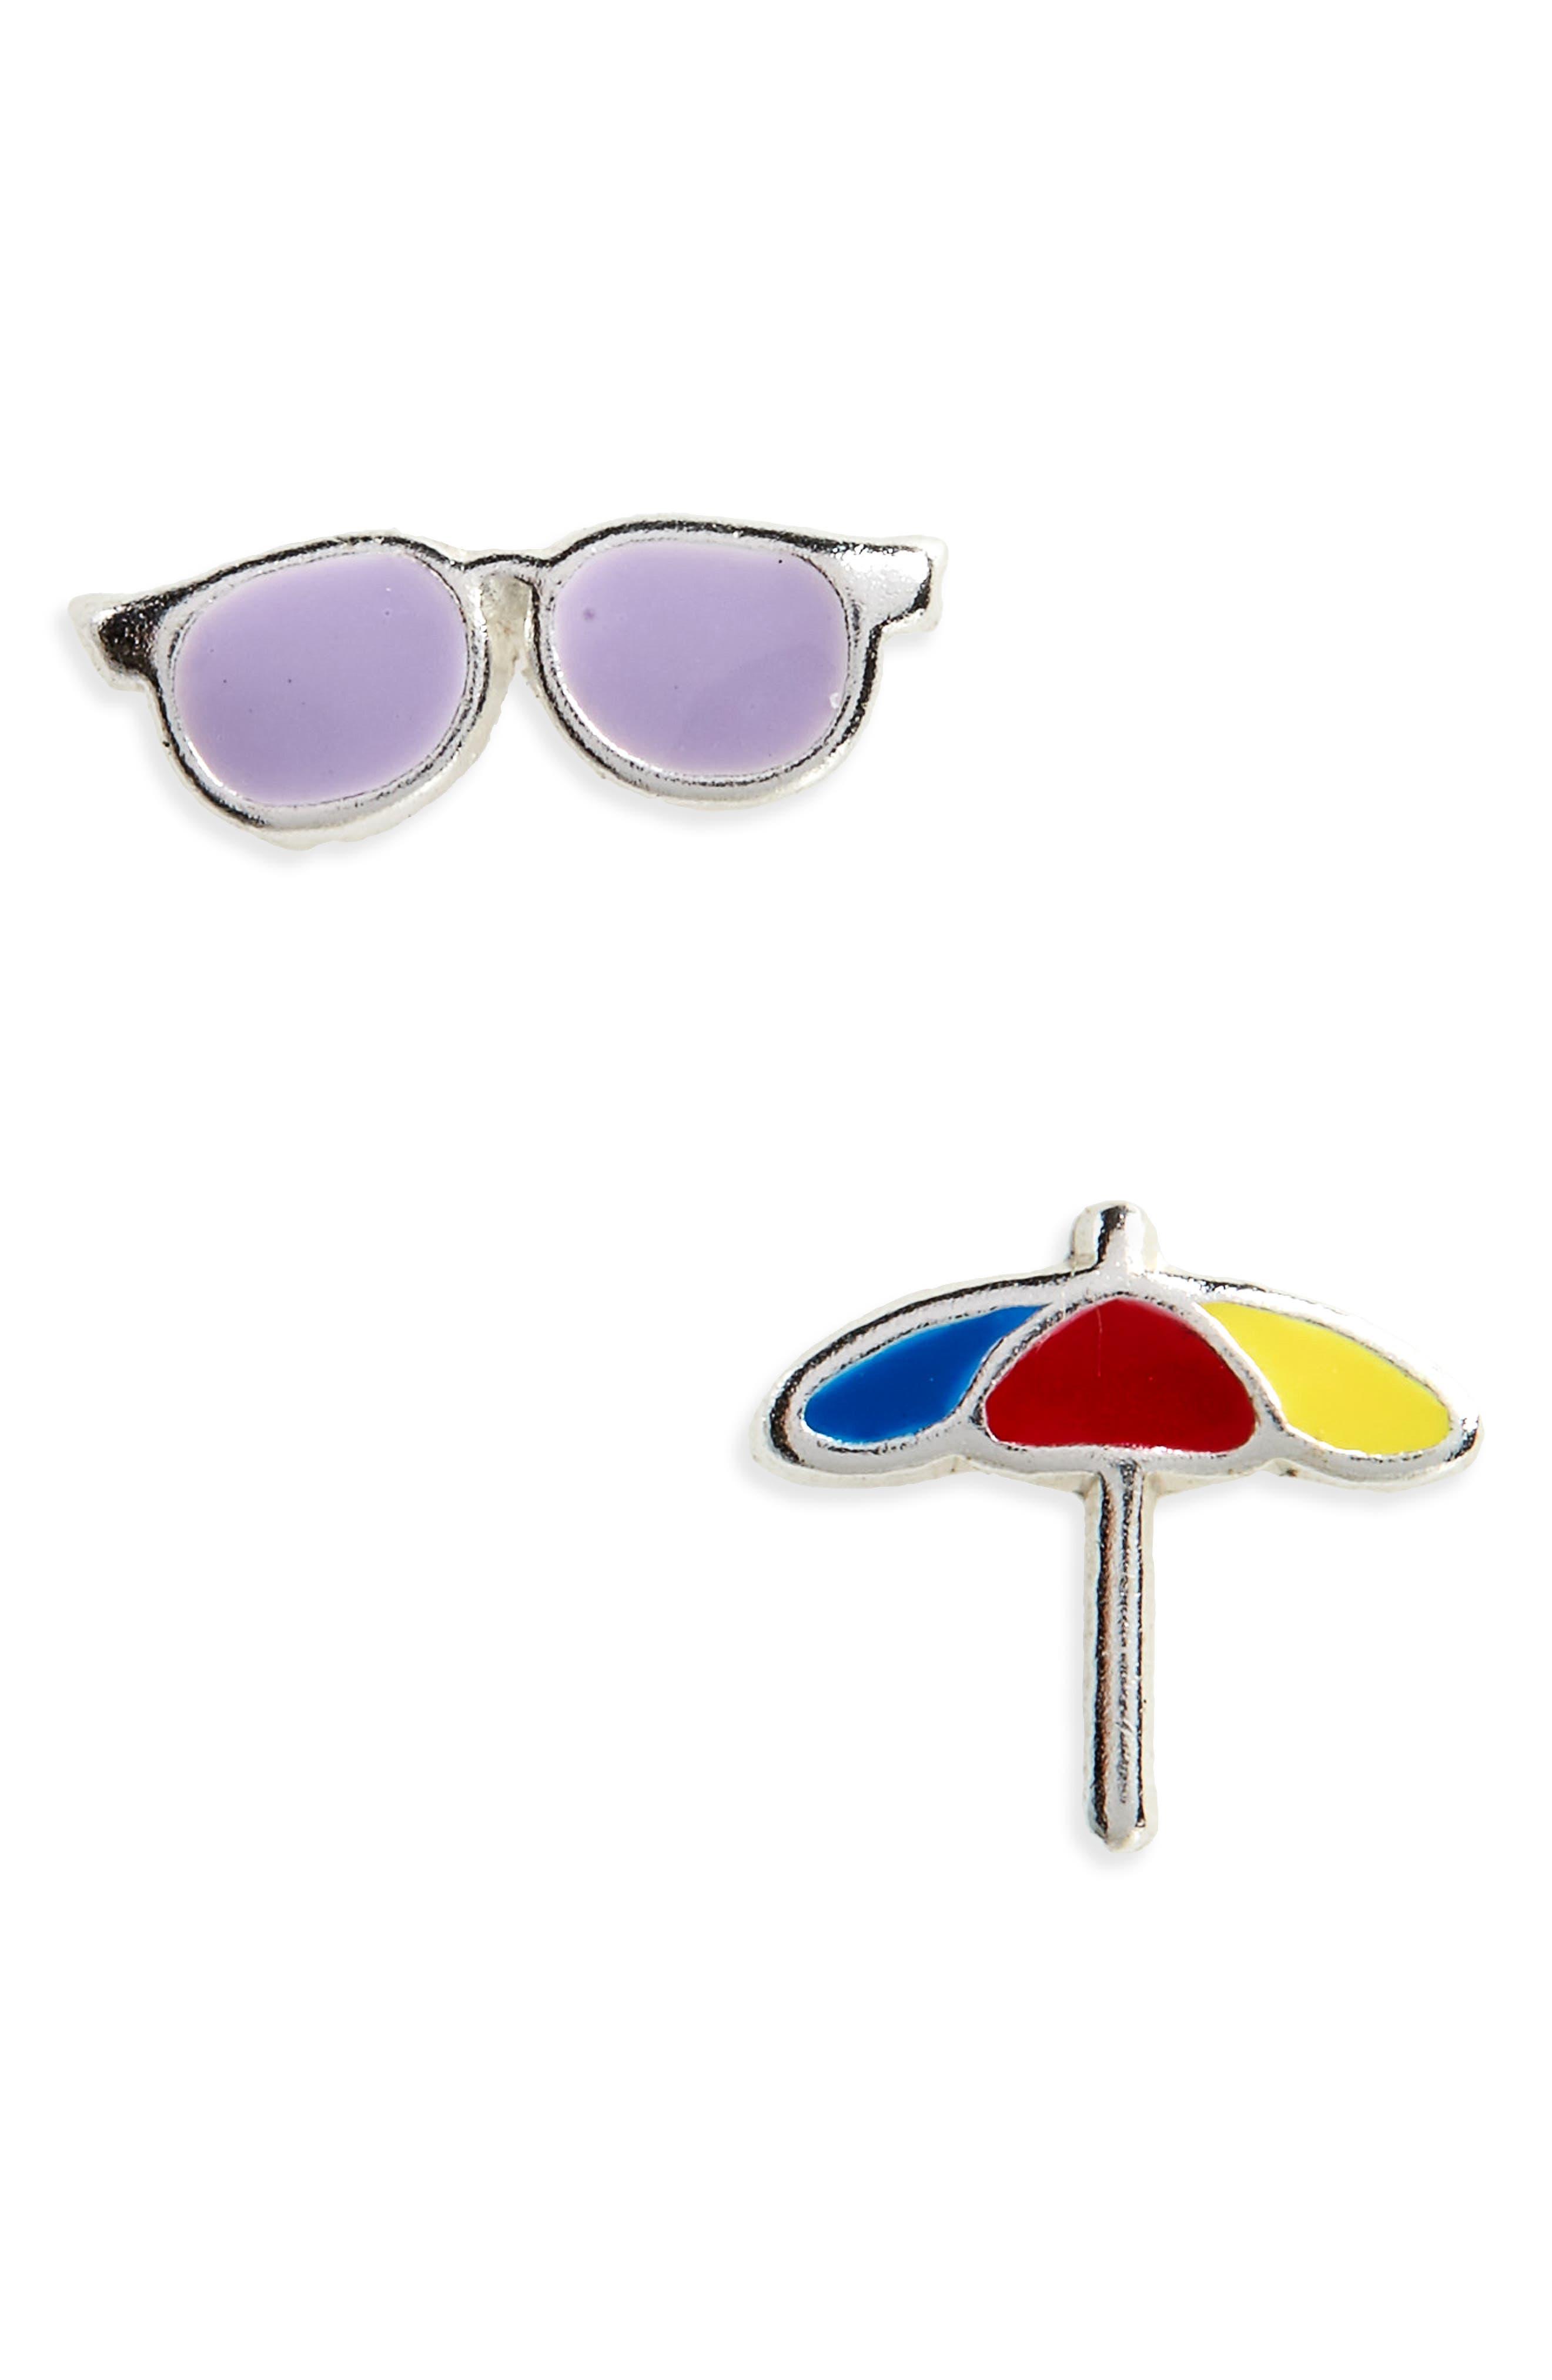 Sunglasses & Beach Umbrella Sterling Silver Stud Earrings,                         Main,                         color, 700